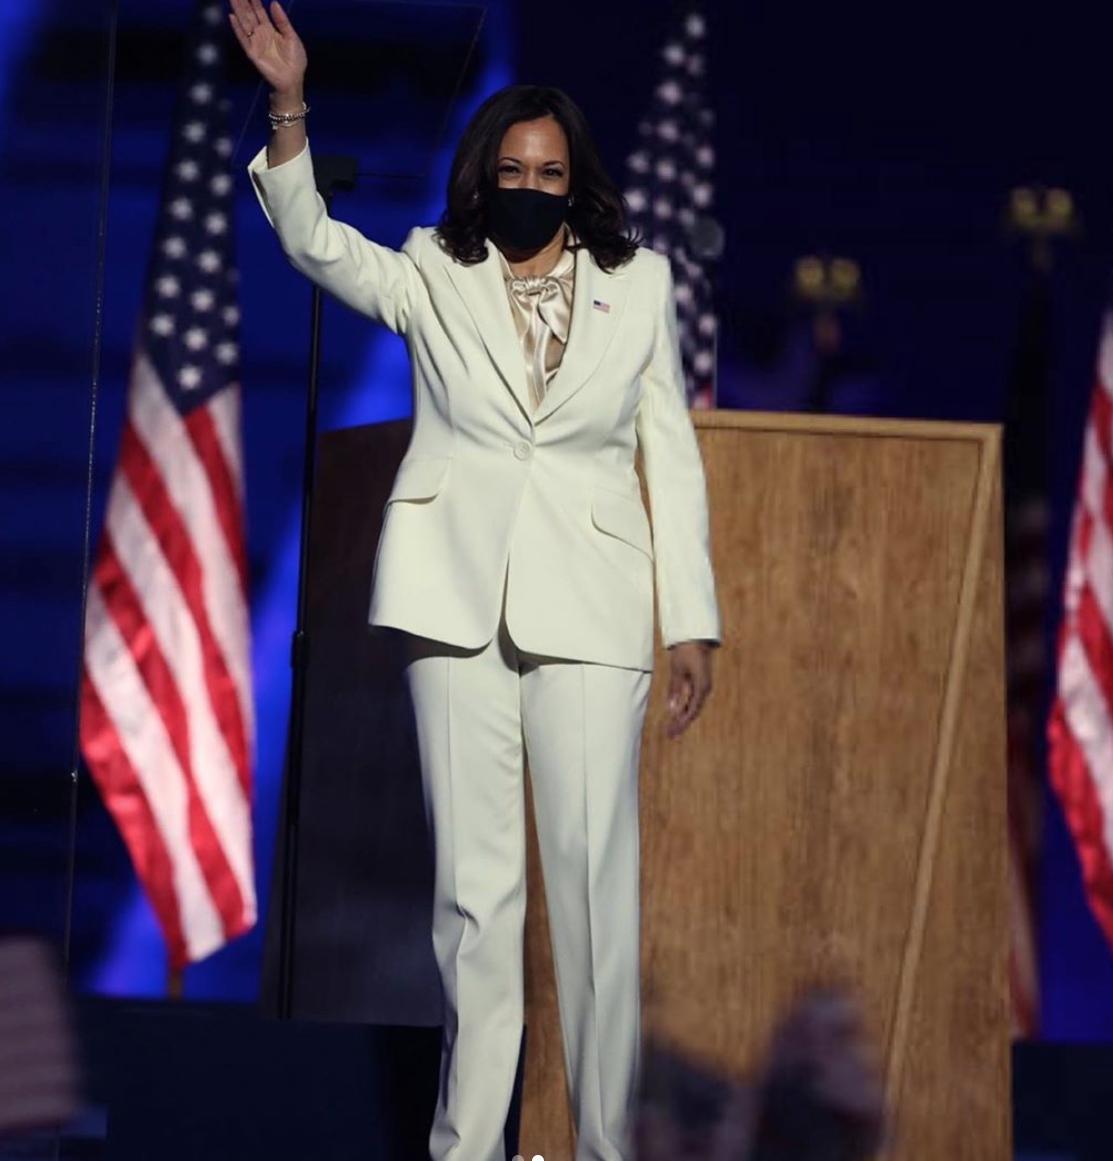 united-states-vice-president-elect-kamala-harris-made-historical-speech-in-carolina-herrera-suit